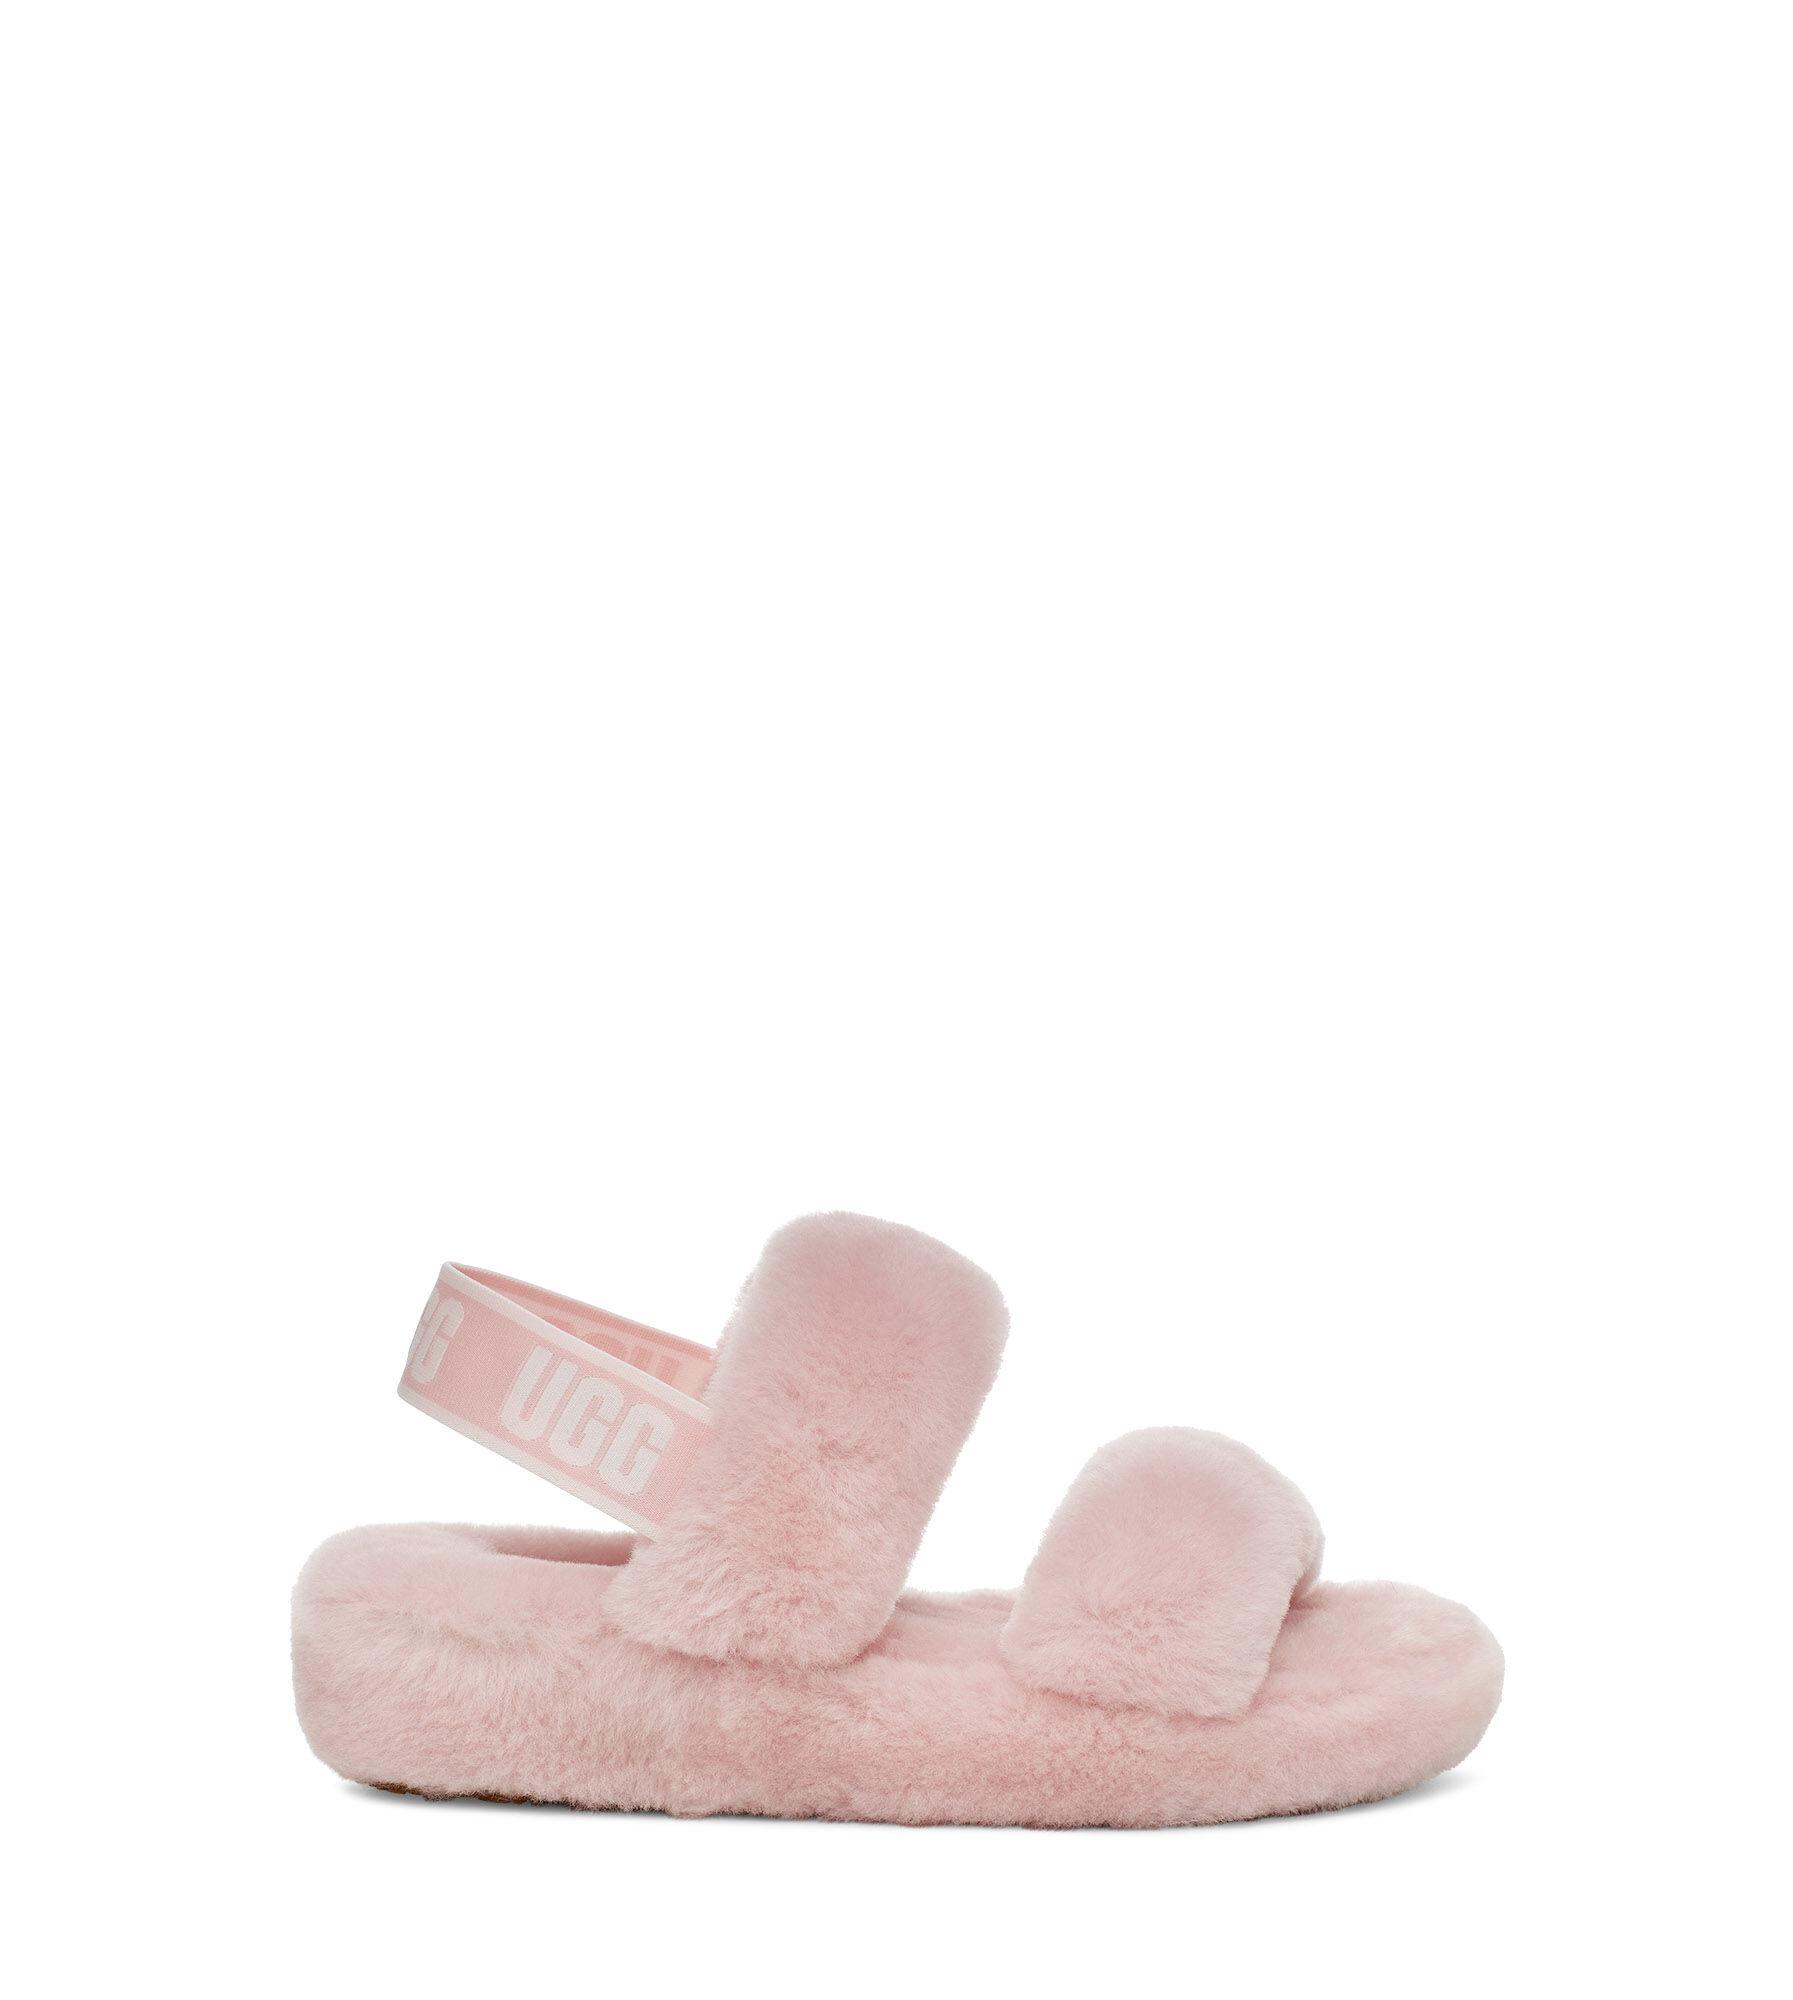 Fluffy Slides \u0026 Women's Furry Slippers